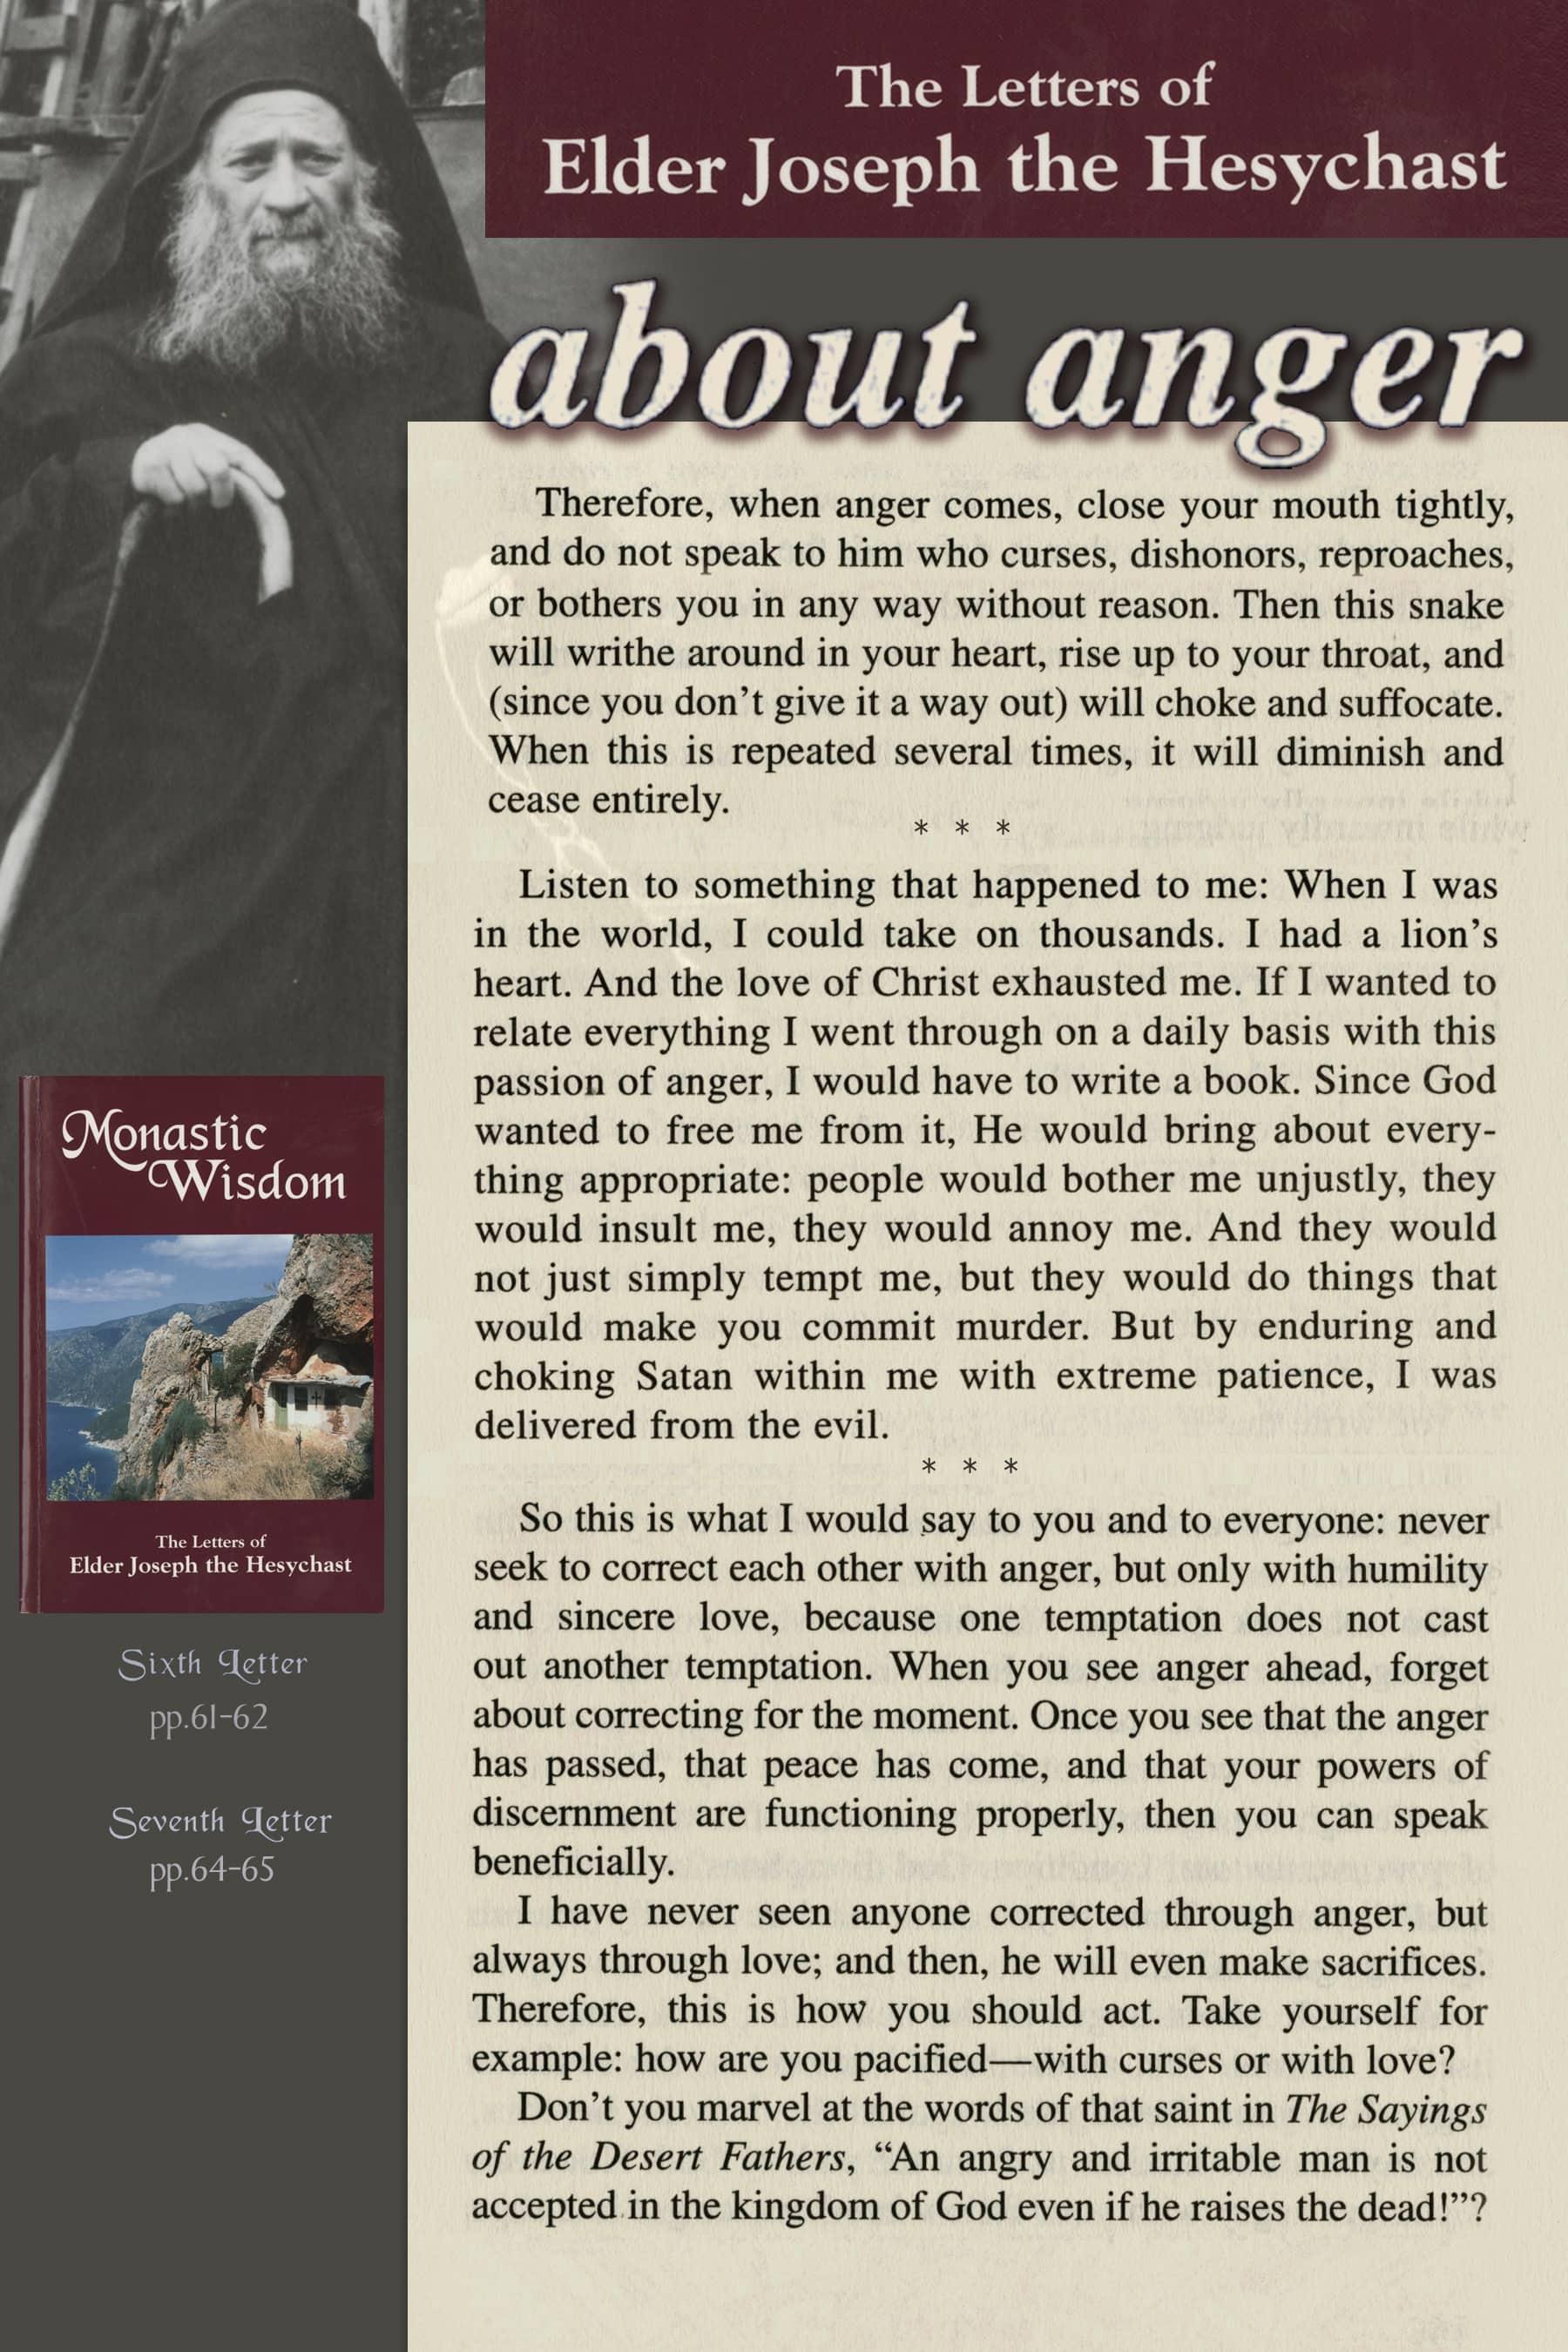 Saint Joseph - about anger